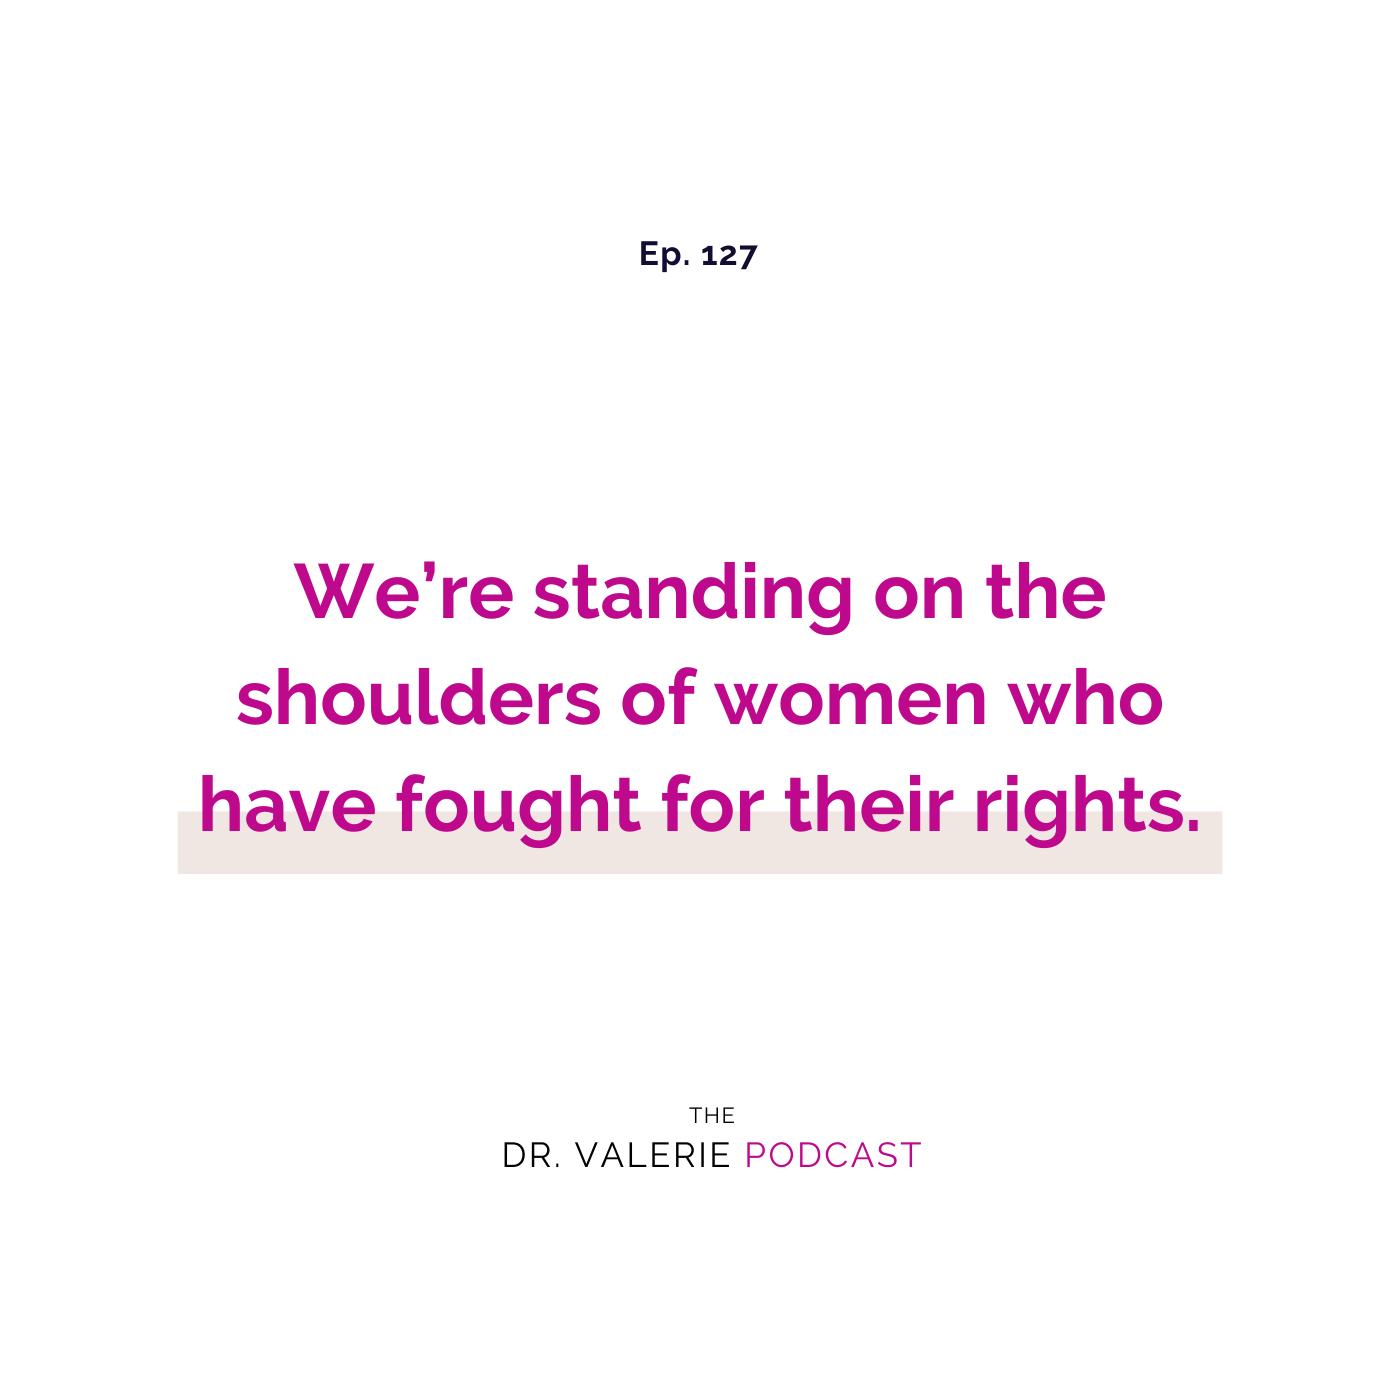 Ep 127 - Honoring All Women